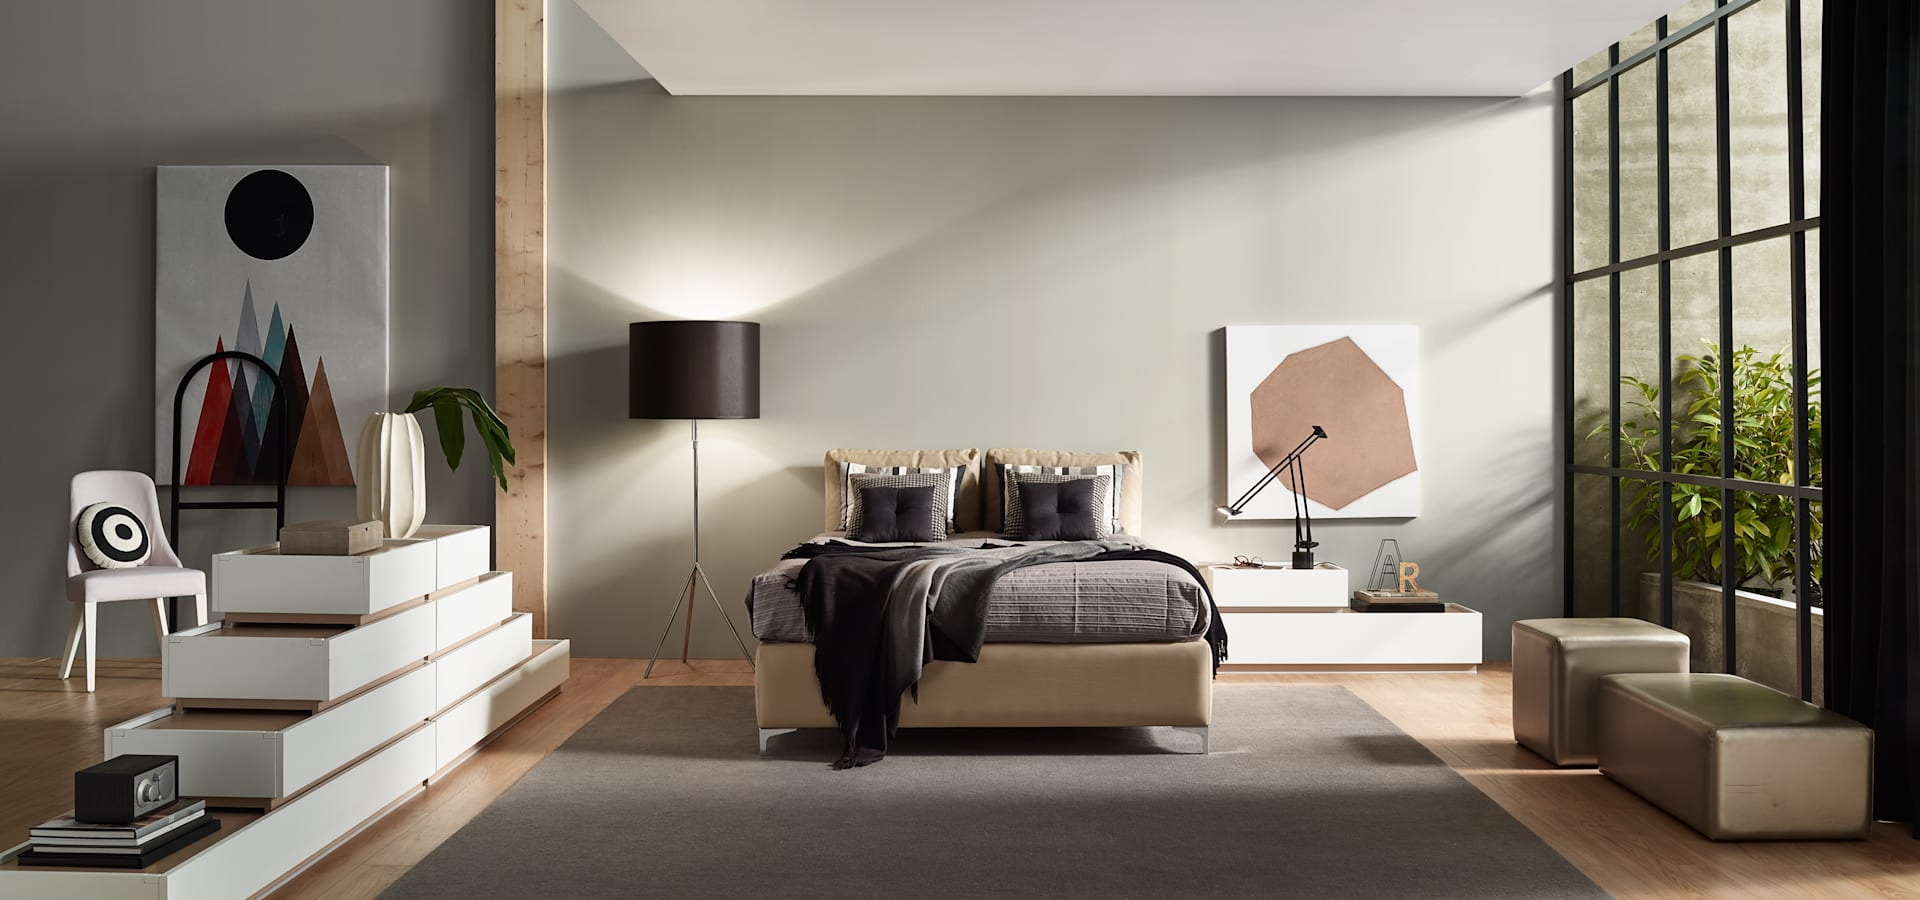 Moverel by moverel ind stria de mobili rio sa homify for Living room 10m2